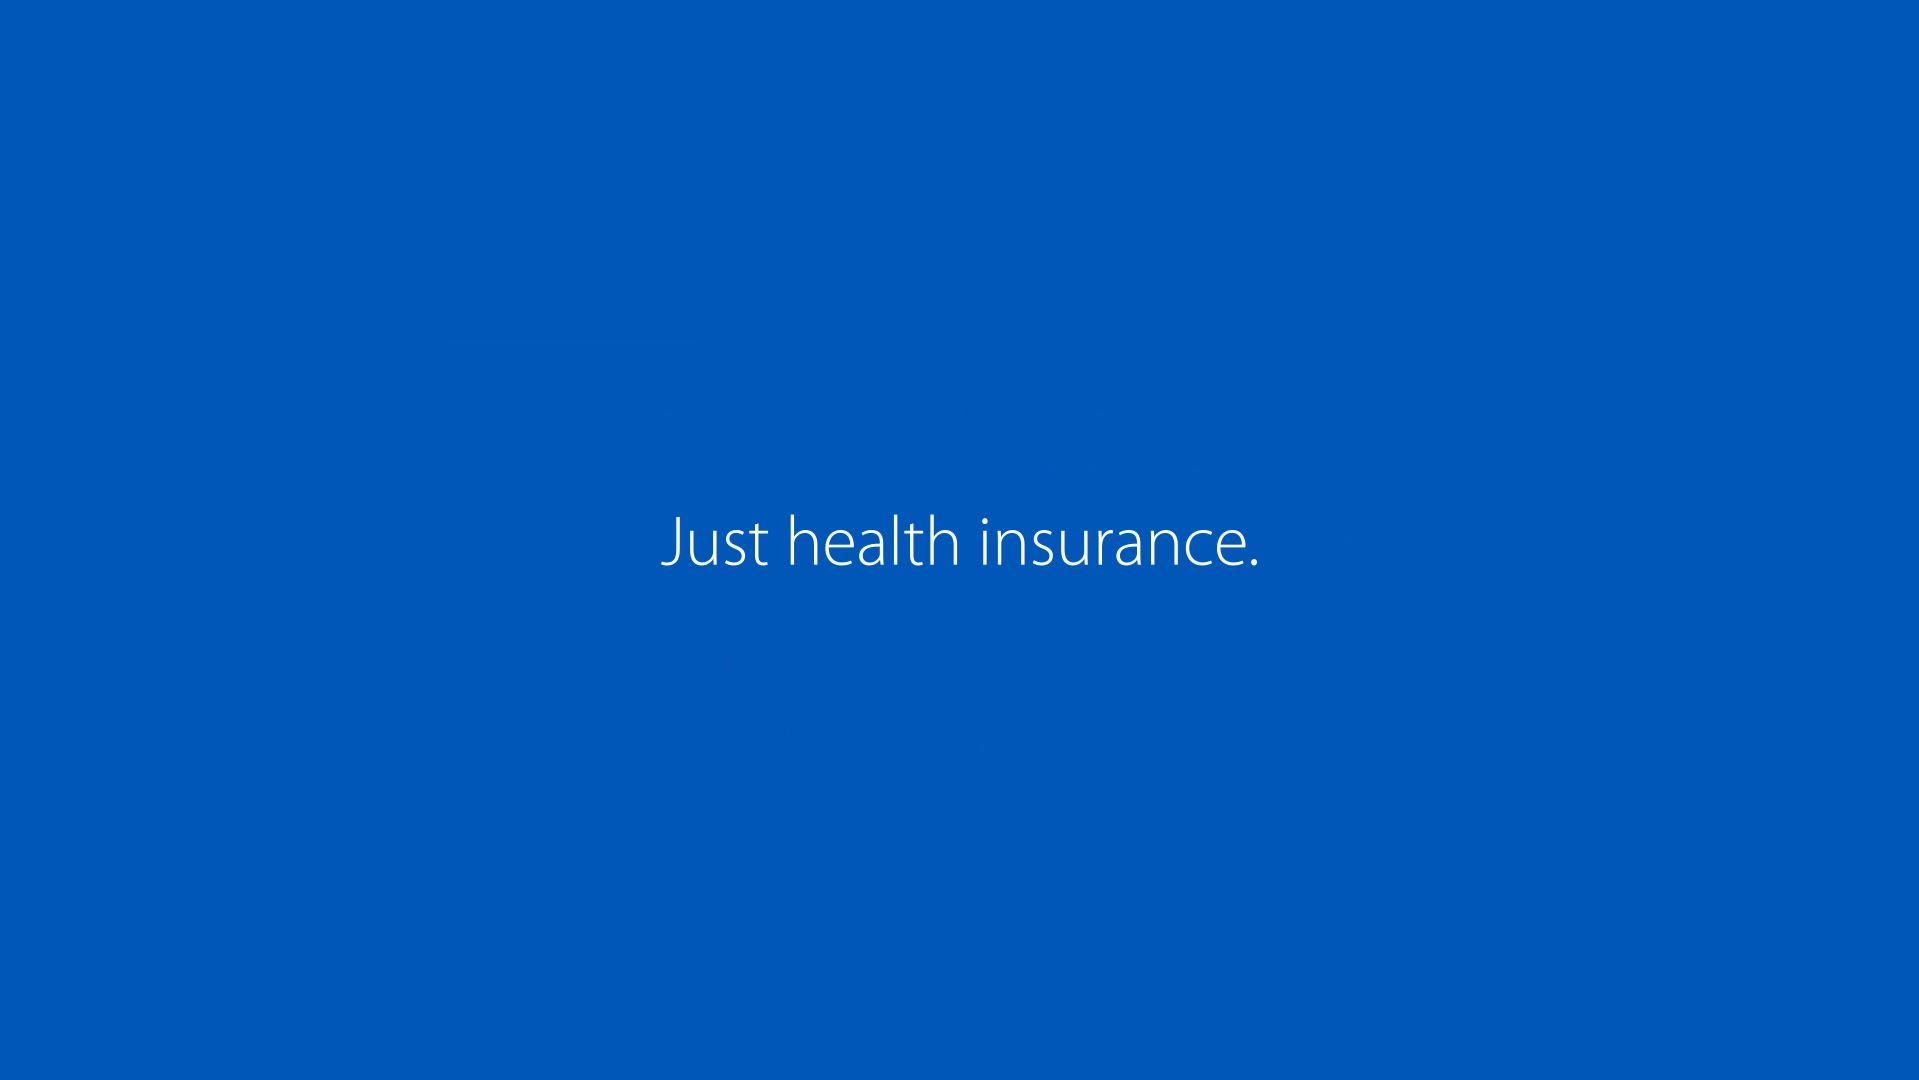 WPA - Just Health Insurance